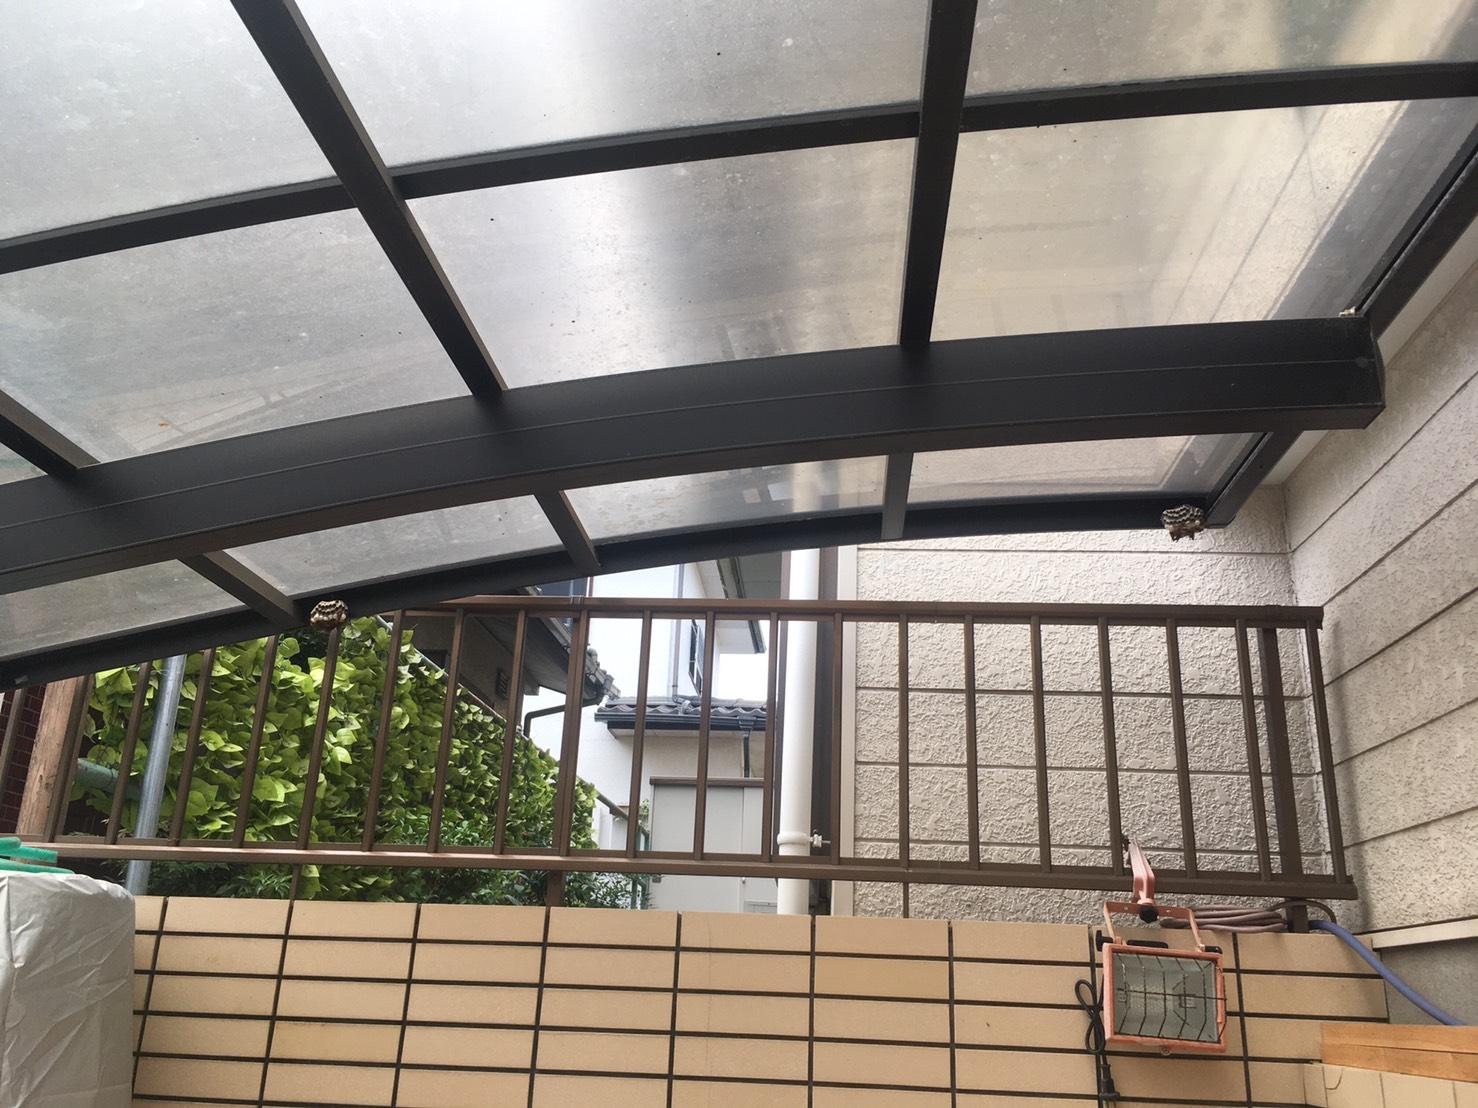 千葉県我孫子市新木野の蜂の巣駆除現場